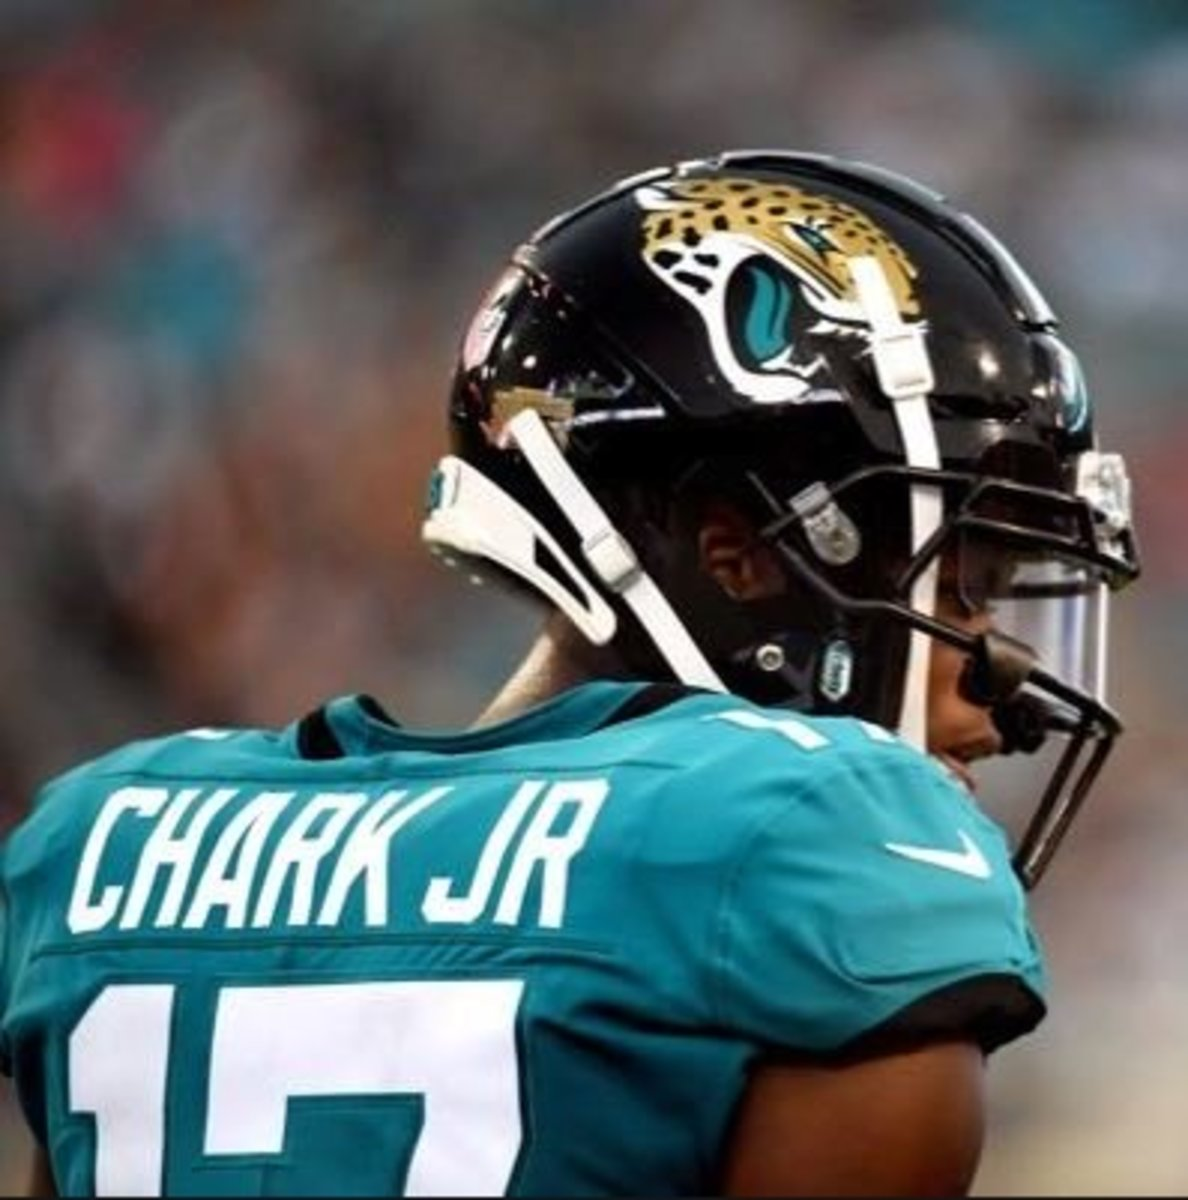 D.J. Chark Jr, WR, Jacksonville Jaguars